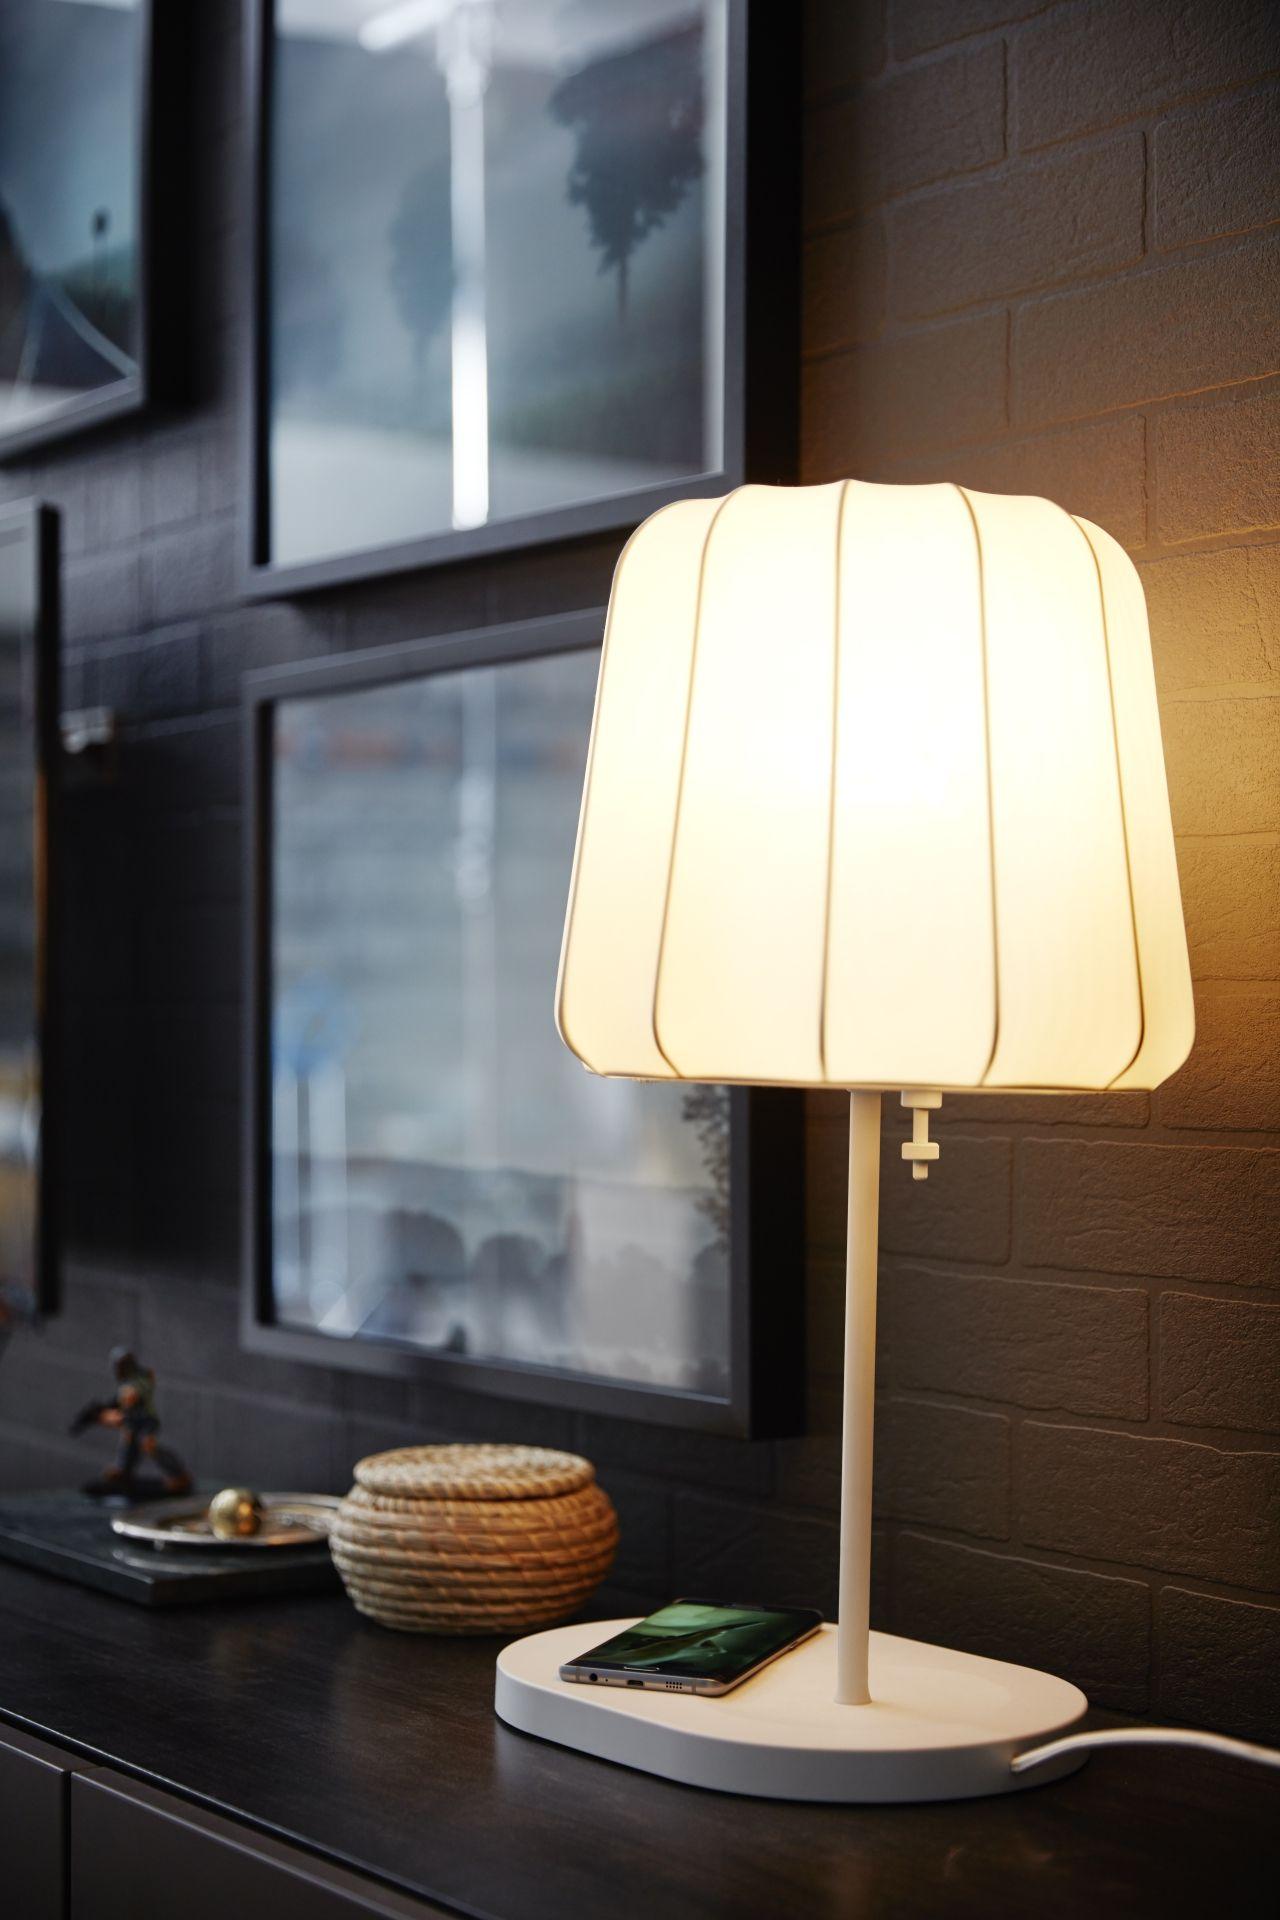 VARV tafellamp met draadloze oplader | #IKEAcatalogus #nieuw #2017 ...